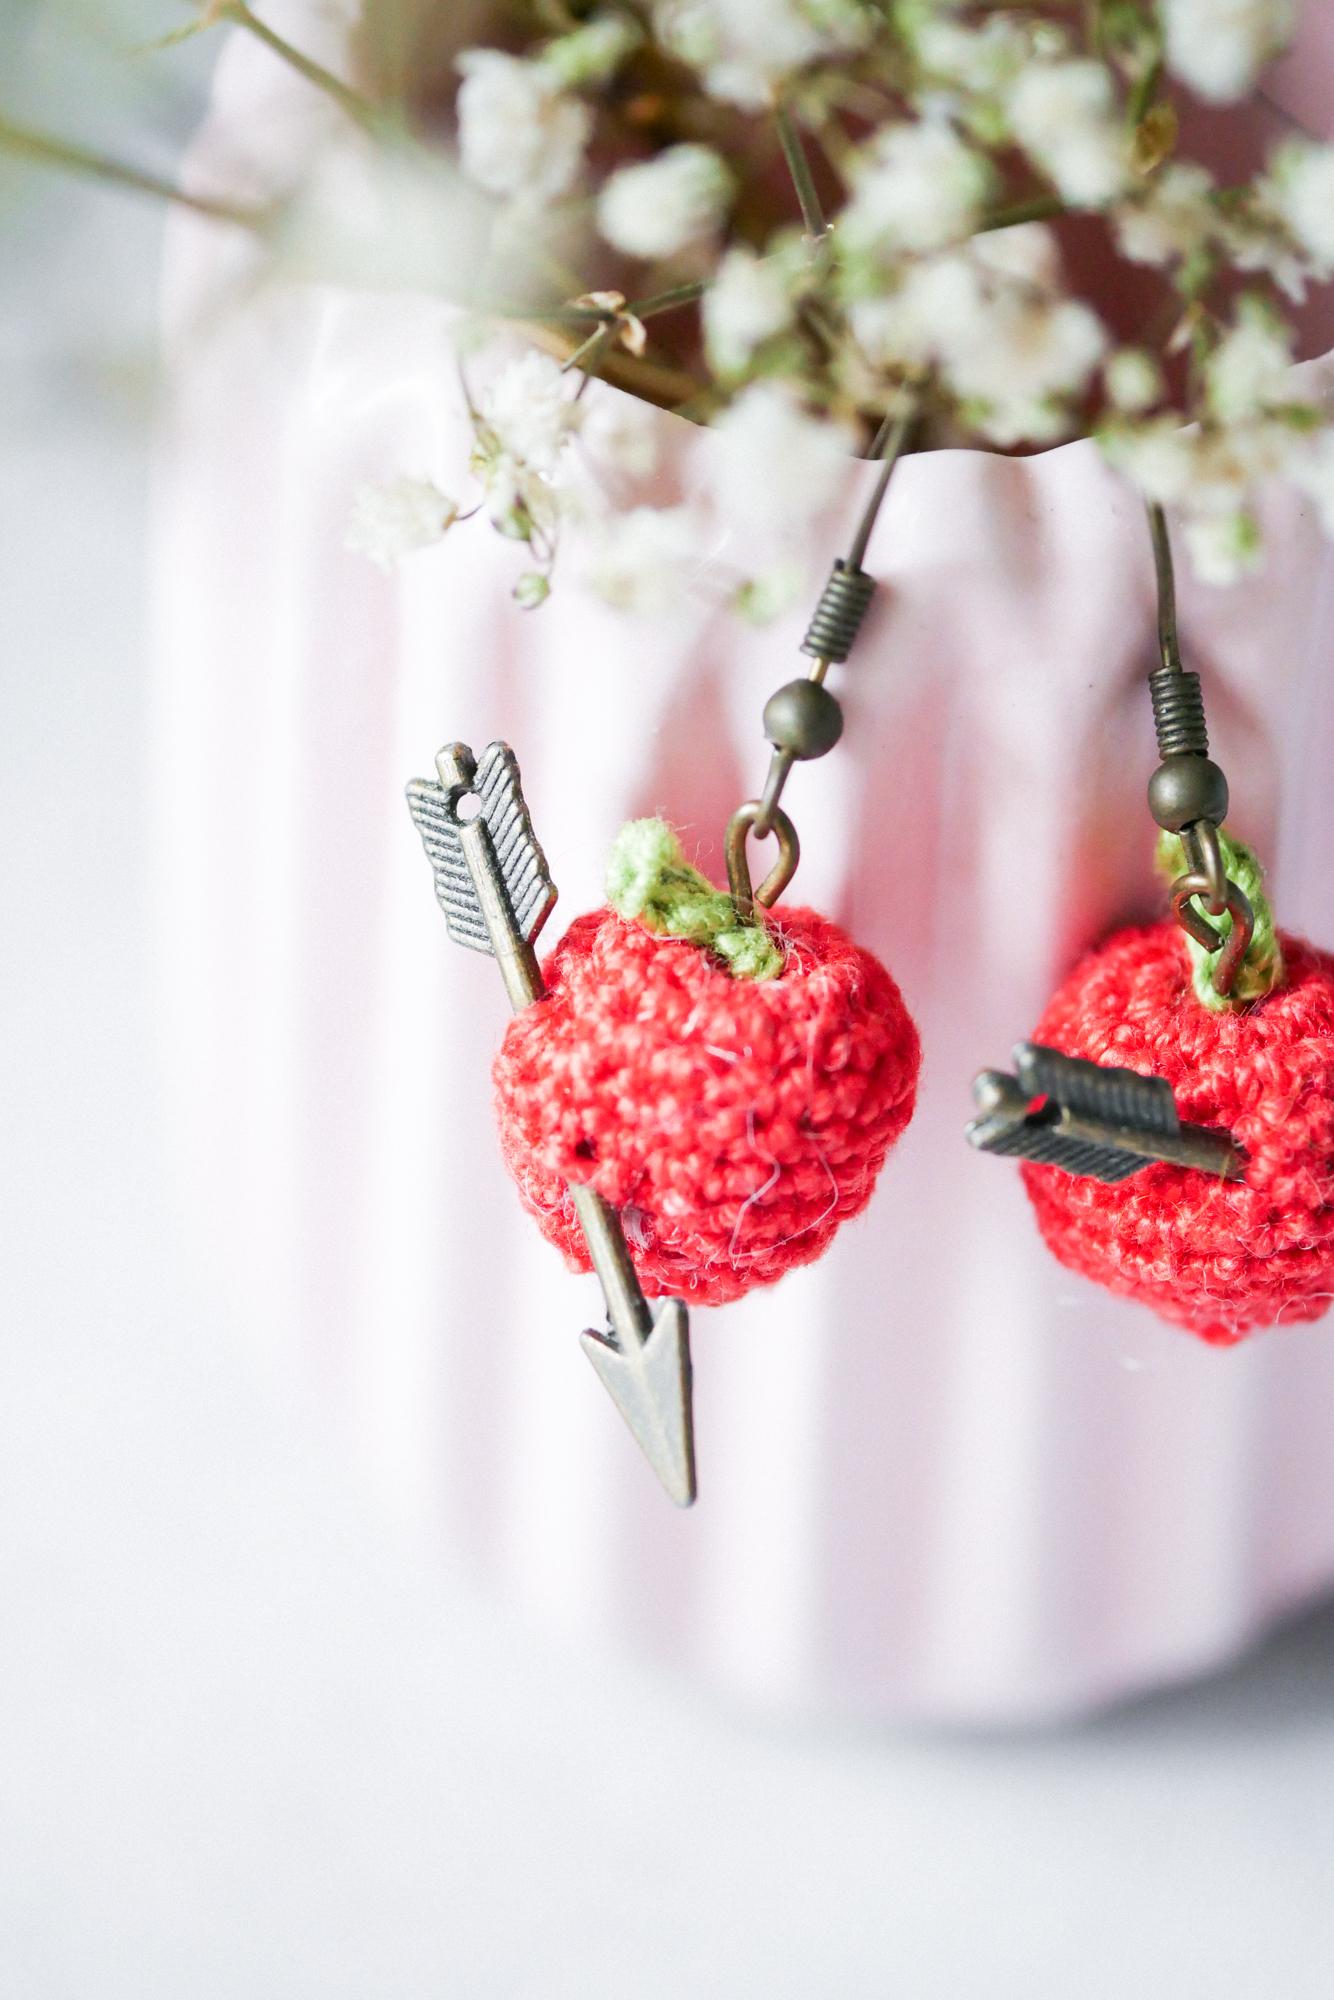 Apfel häkeln- filigrane Schmuckstücke im Obst-Look